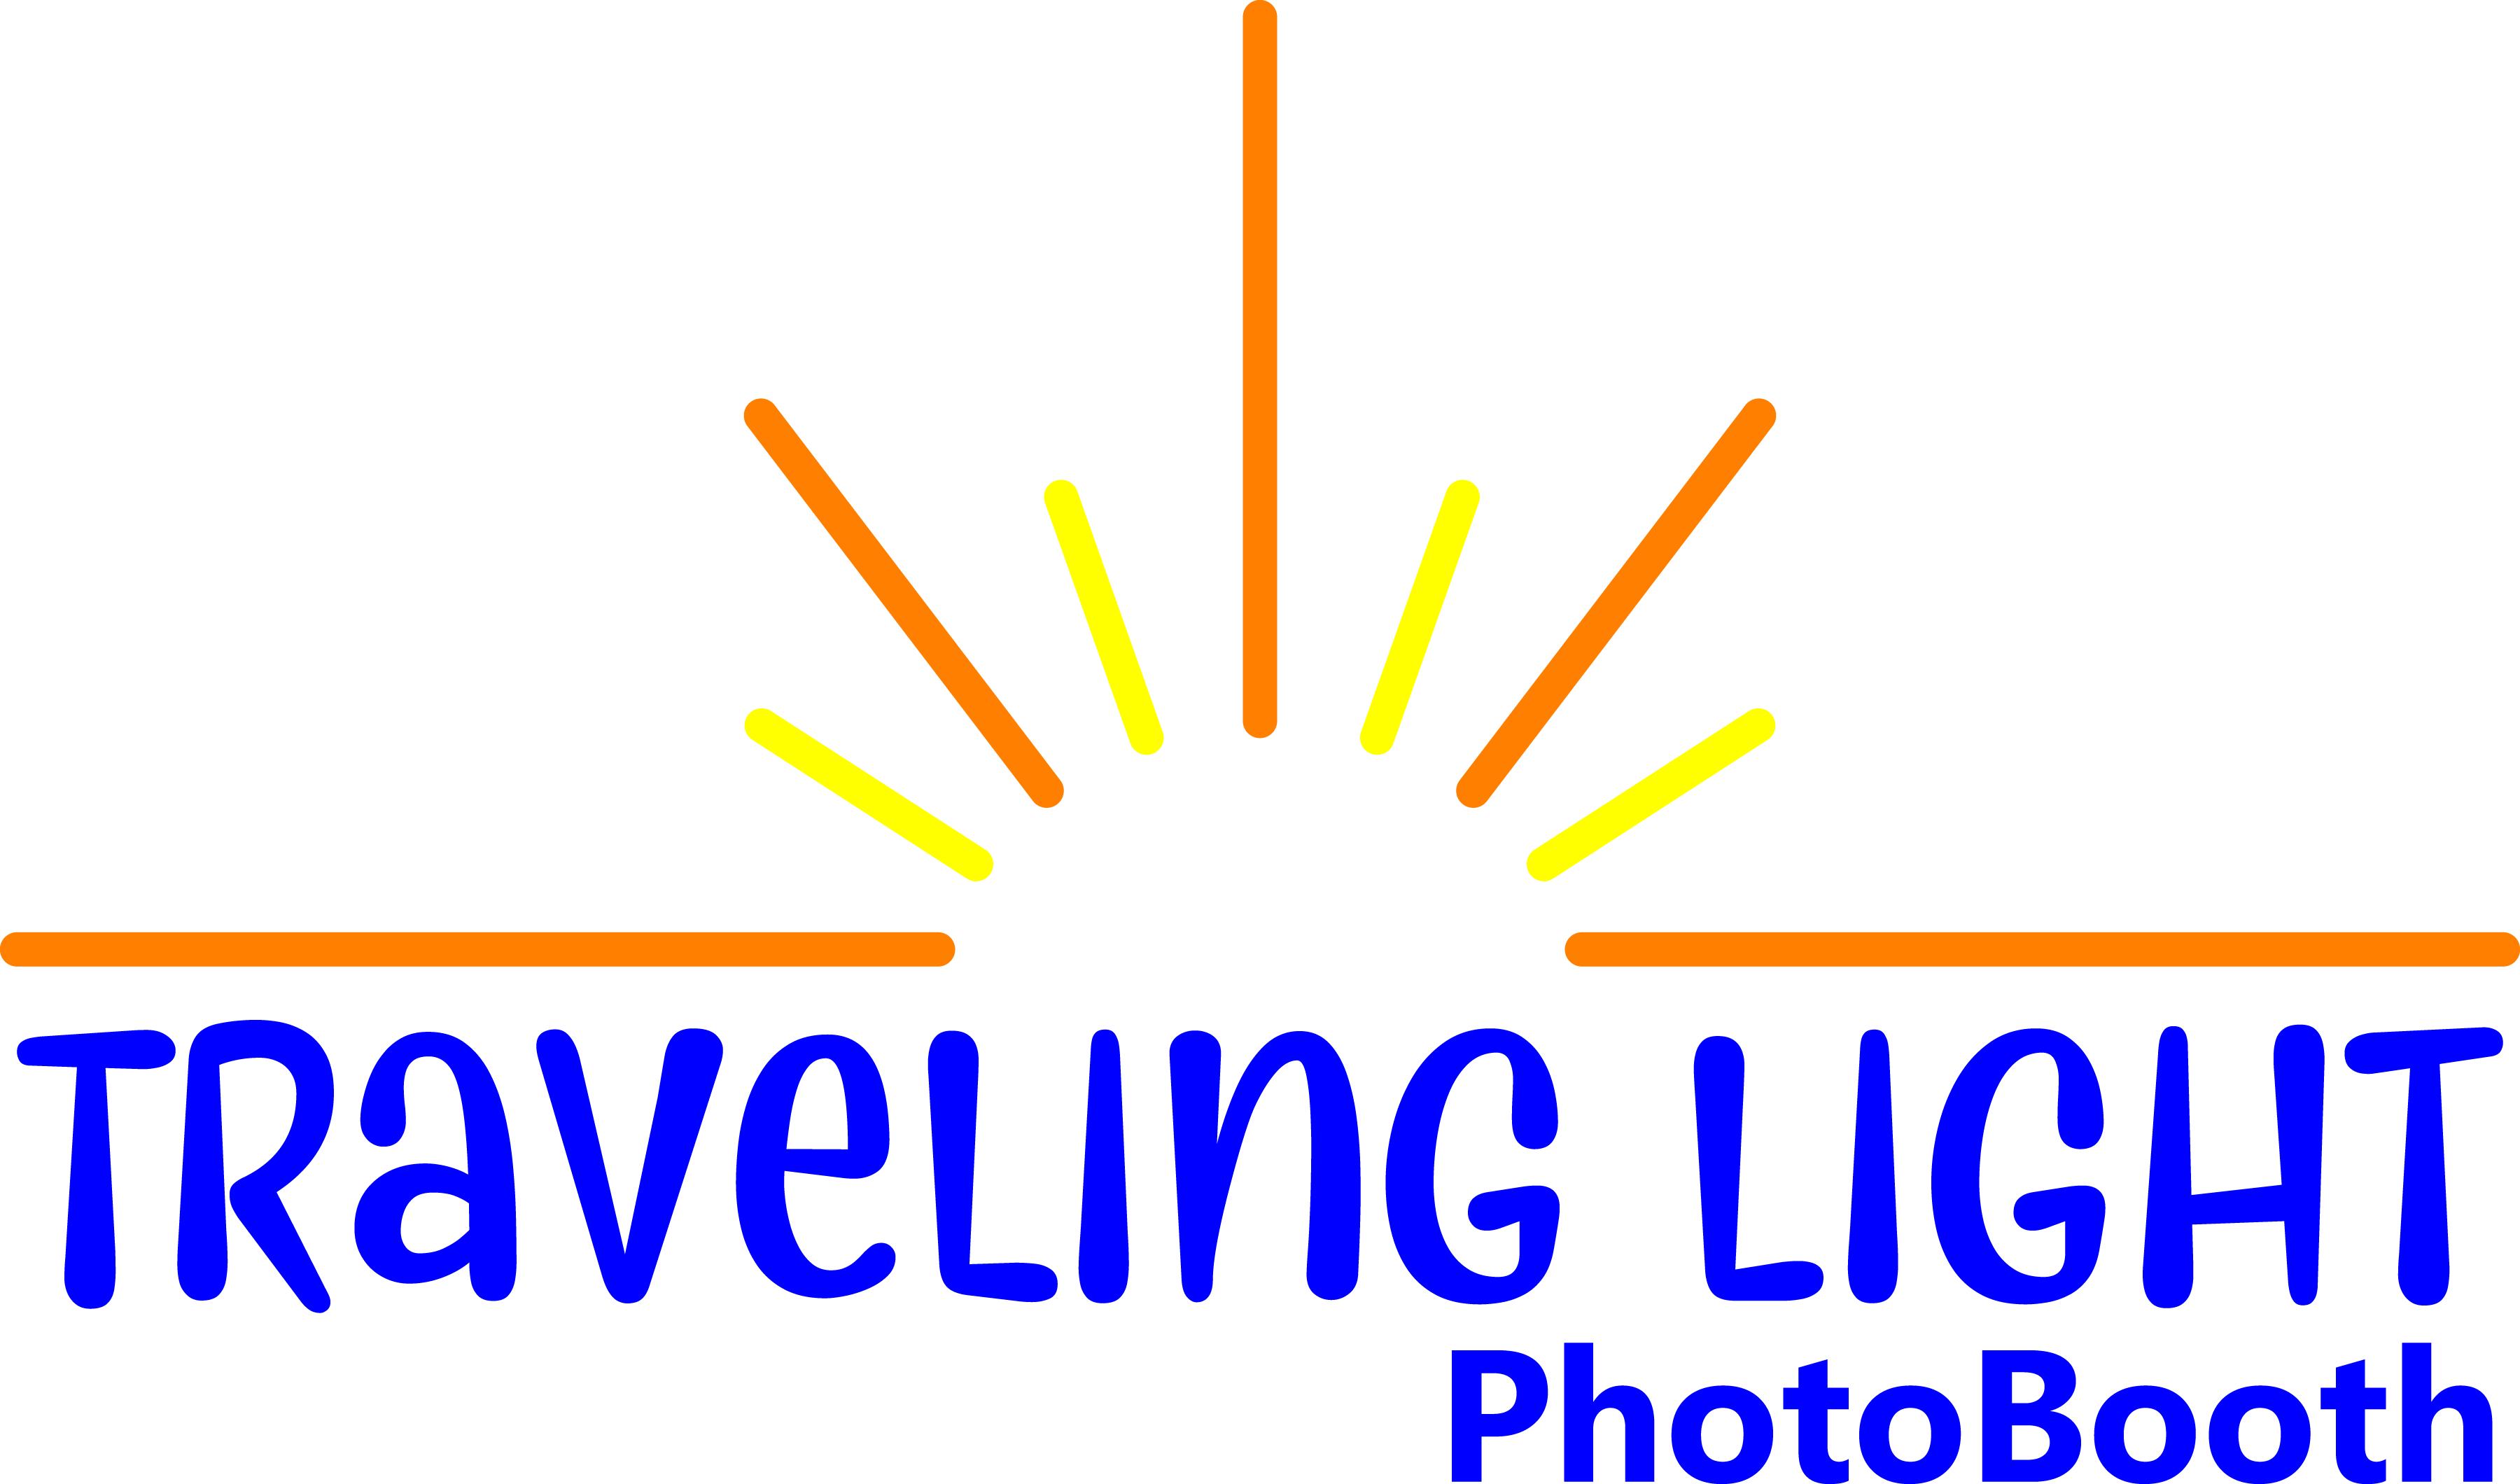 Traveling Light PhotoBooth